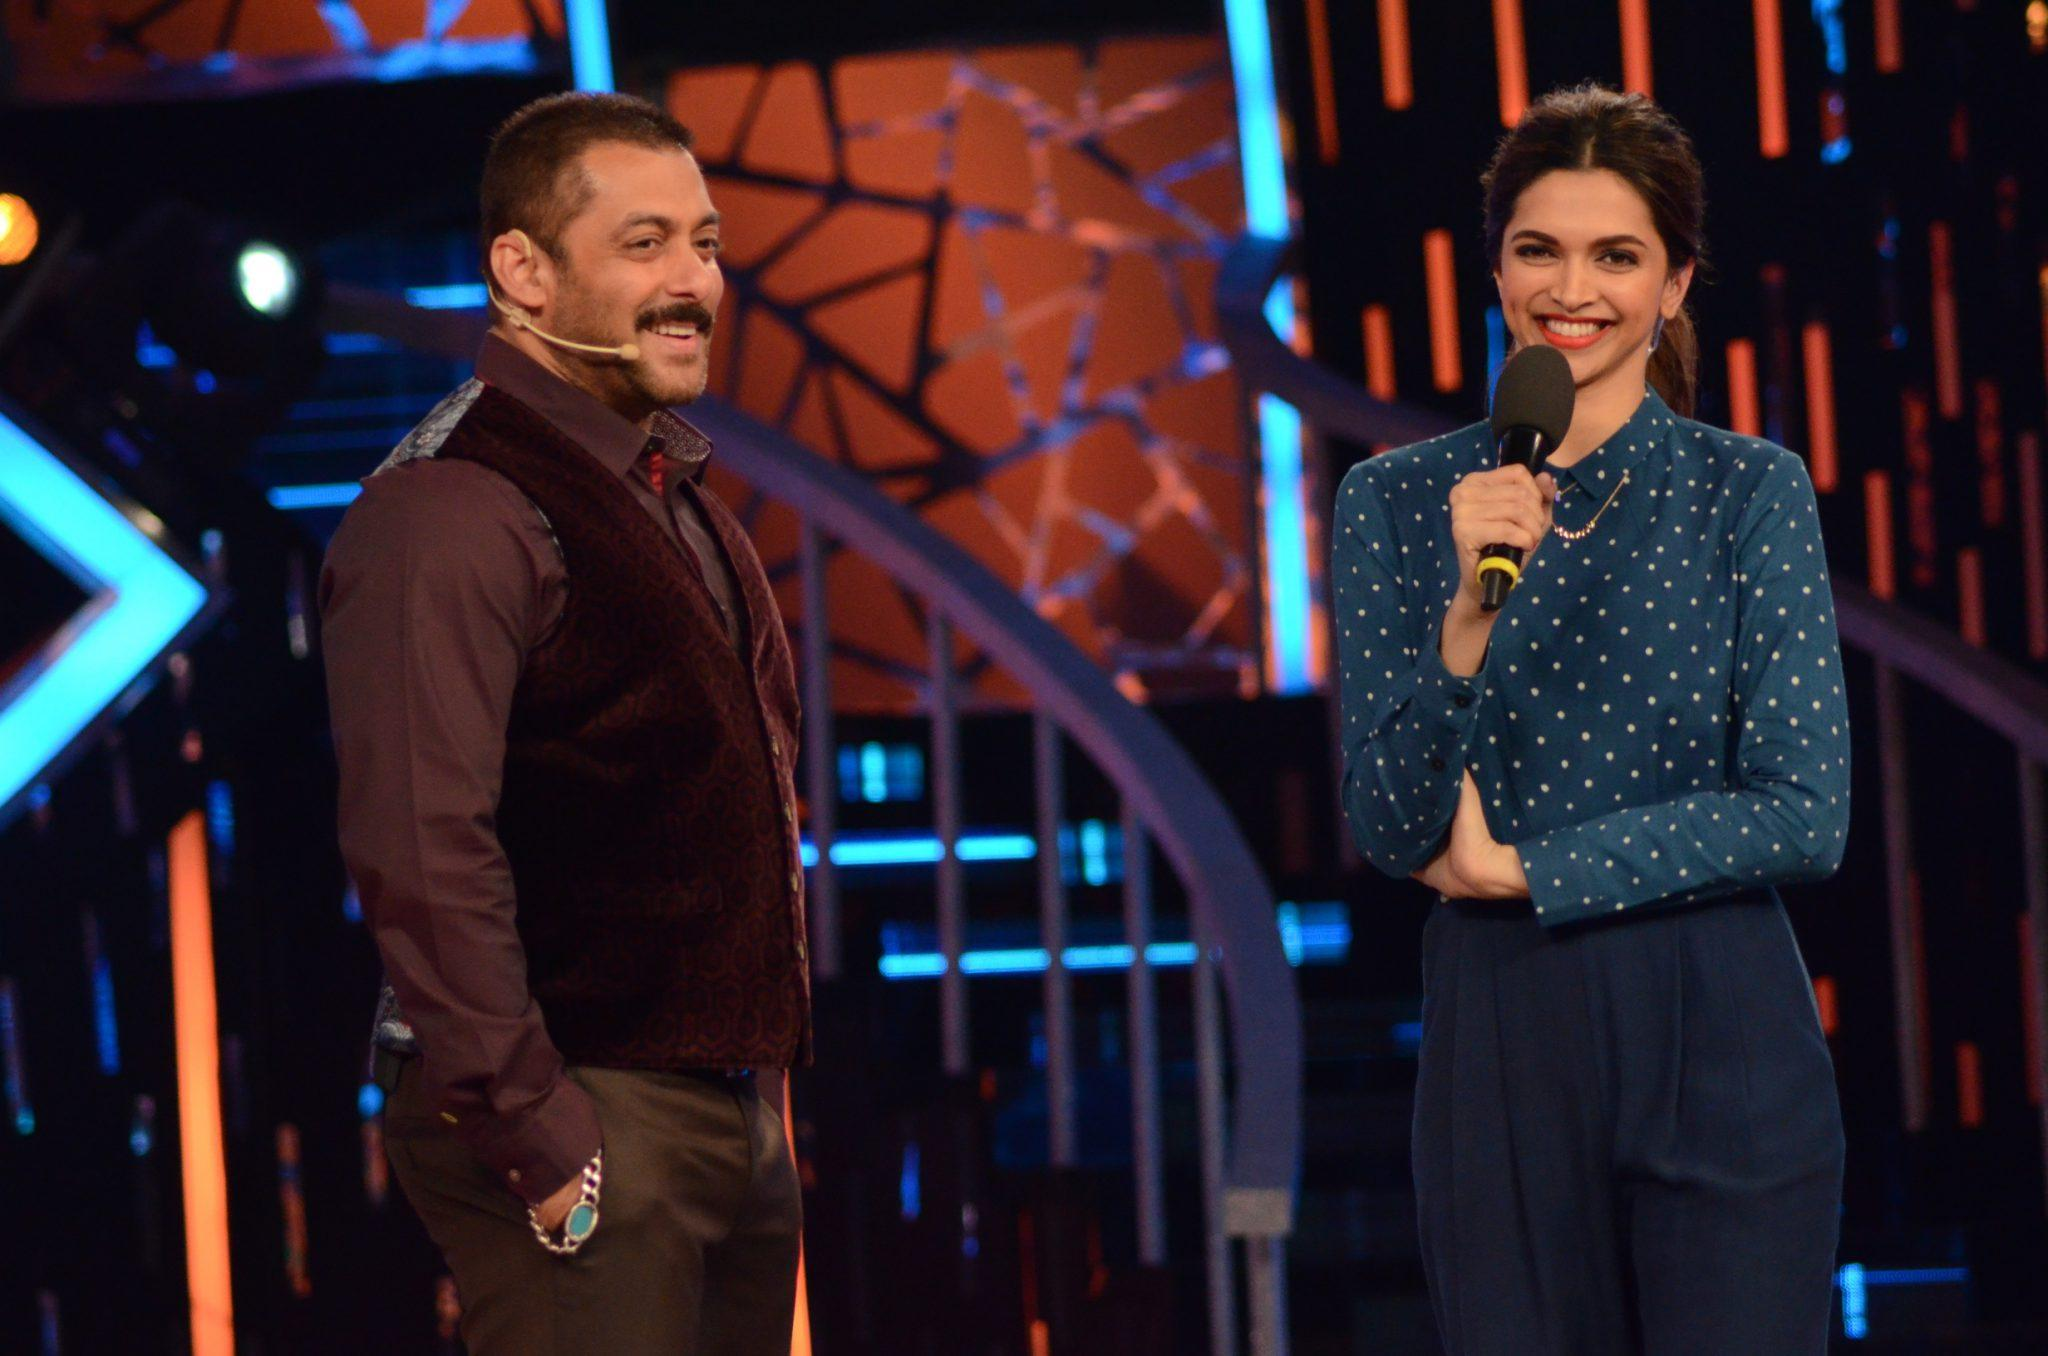 Salman Khan and Deepika Padukone to be in Bhansali's Next?